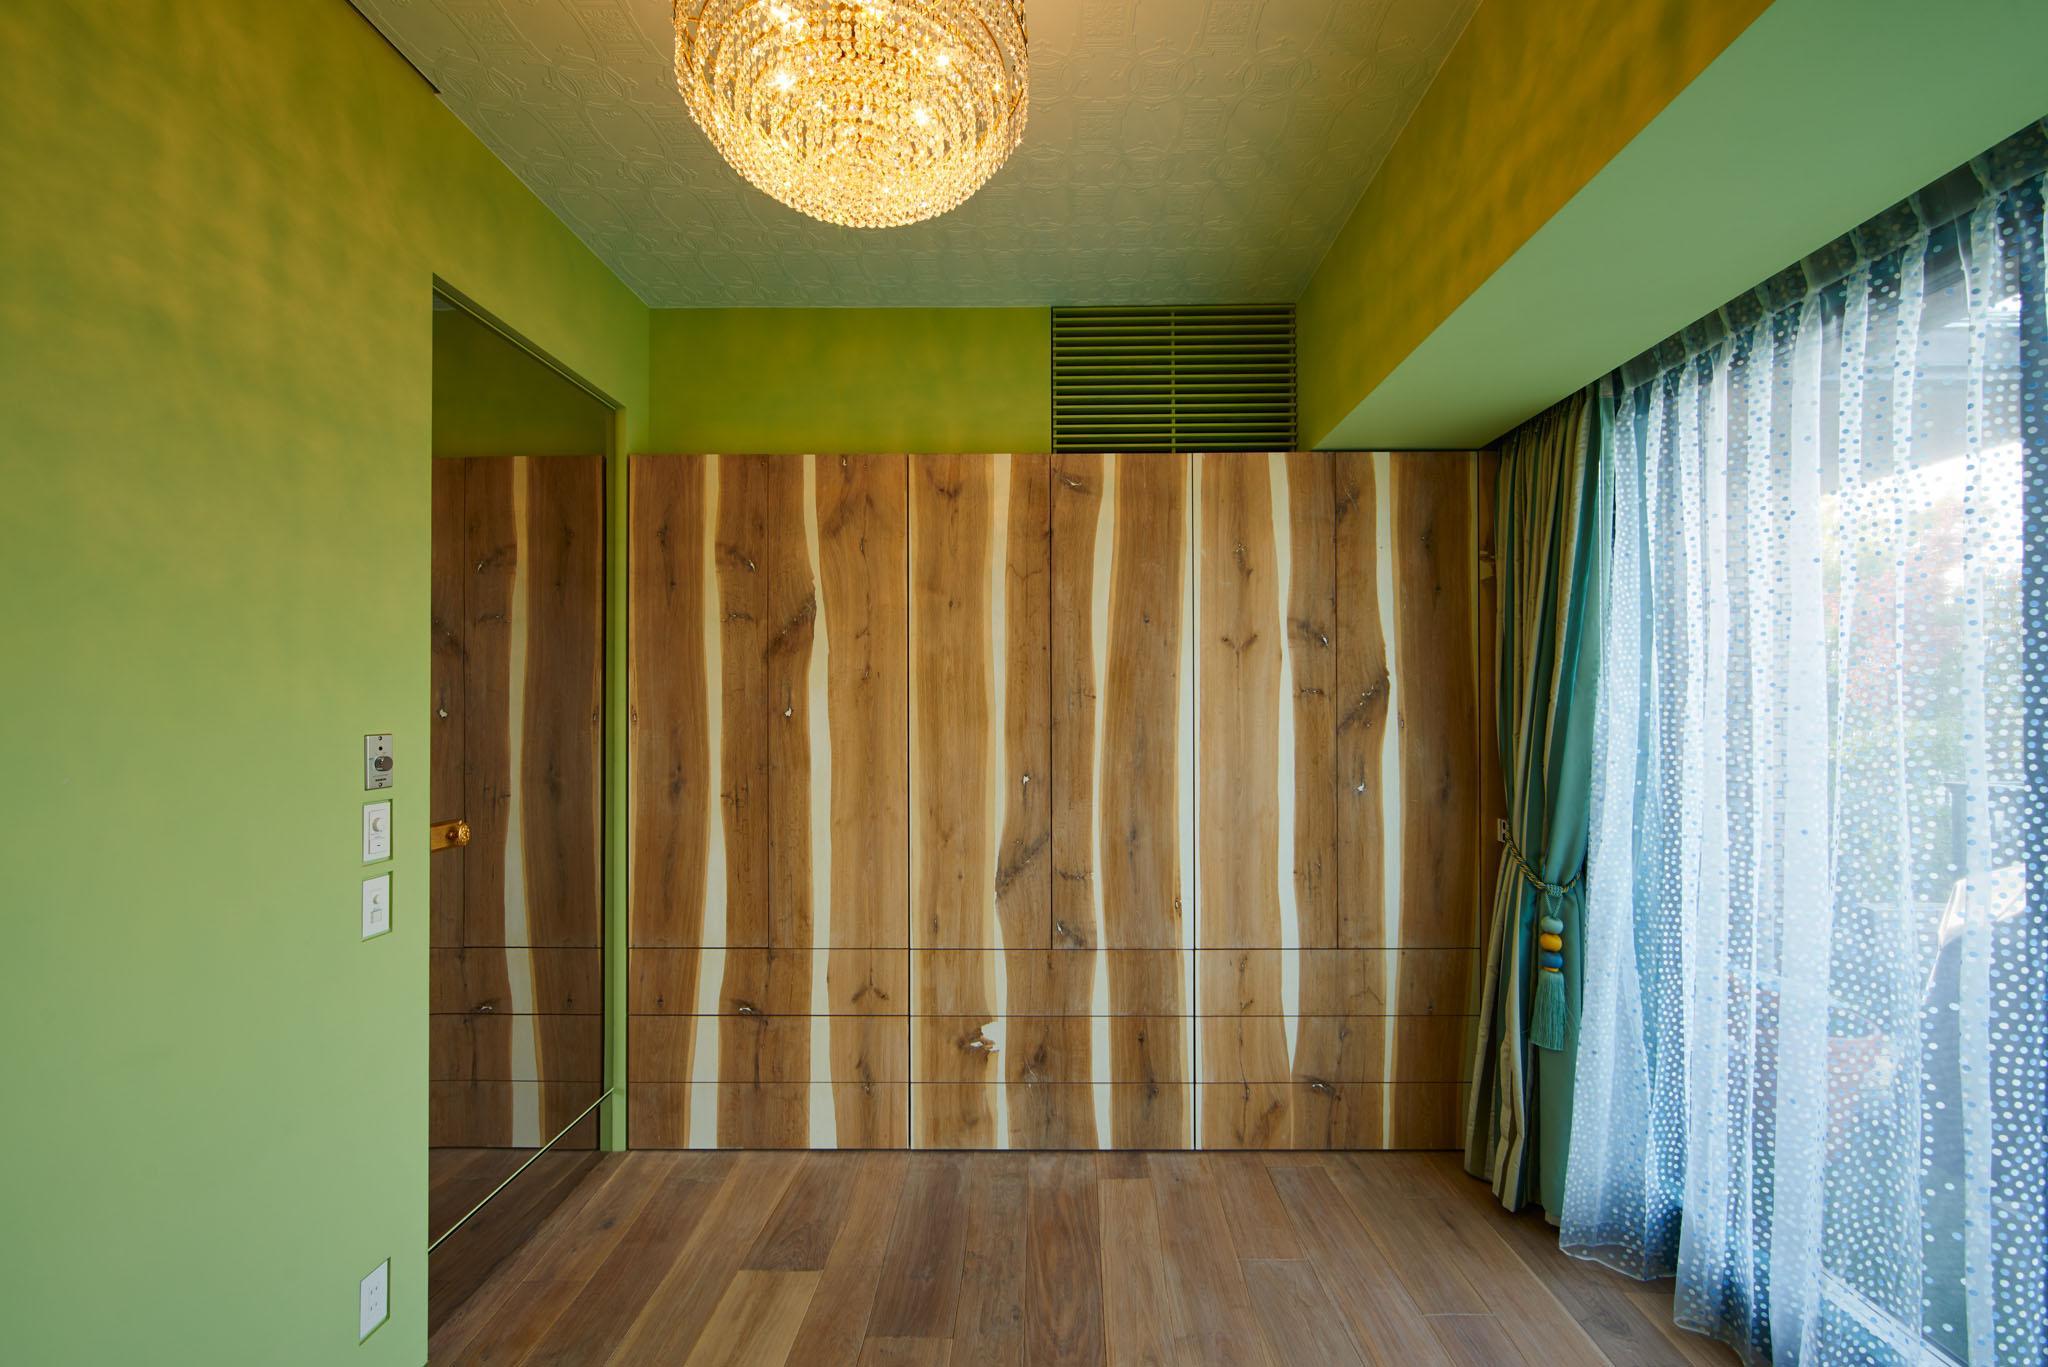 G-HOUSEの写真 収納棚が印象的な緑色の壁の洋室